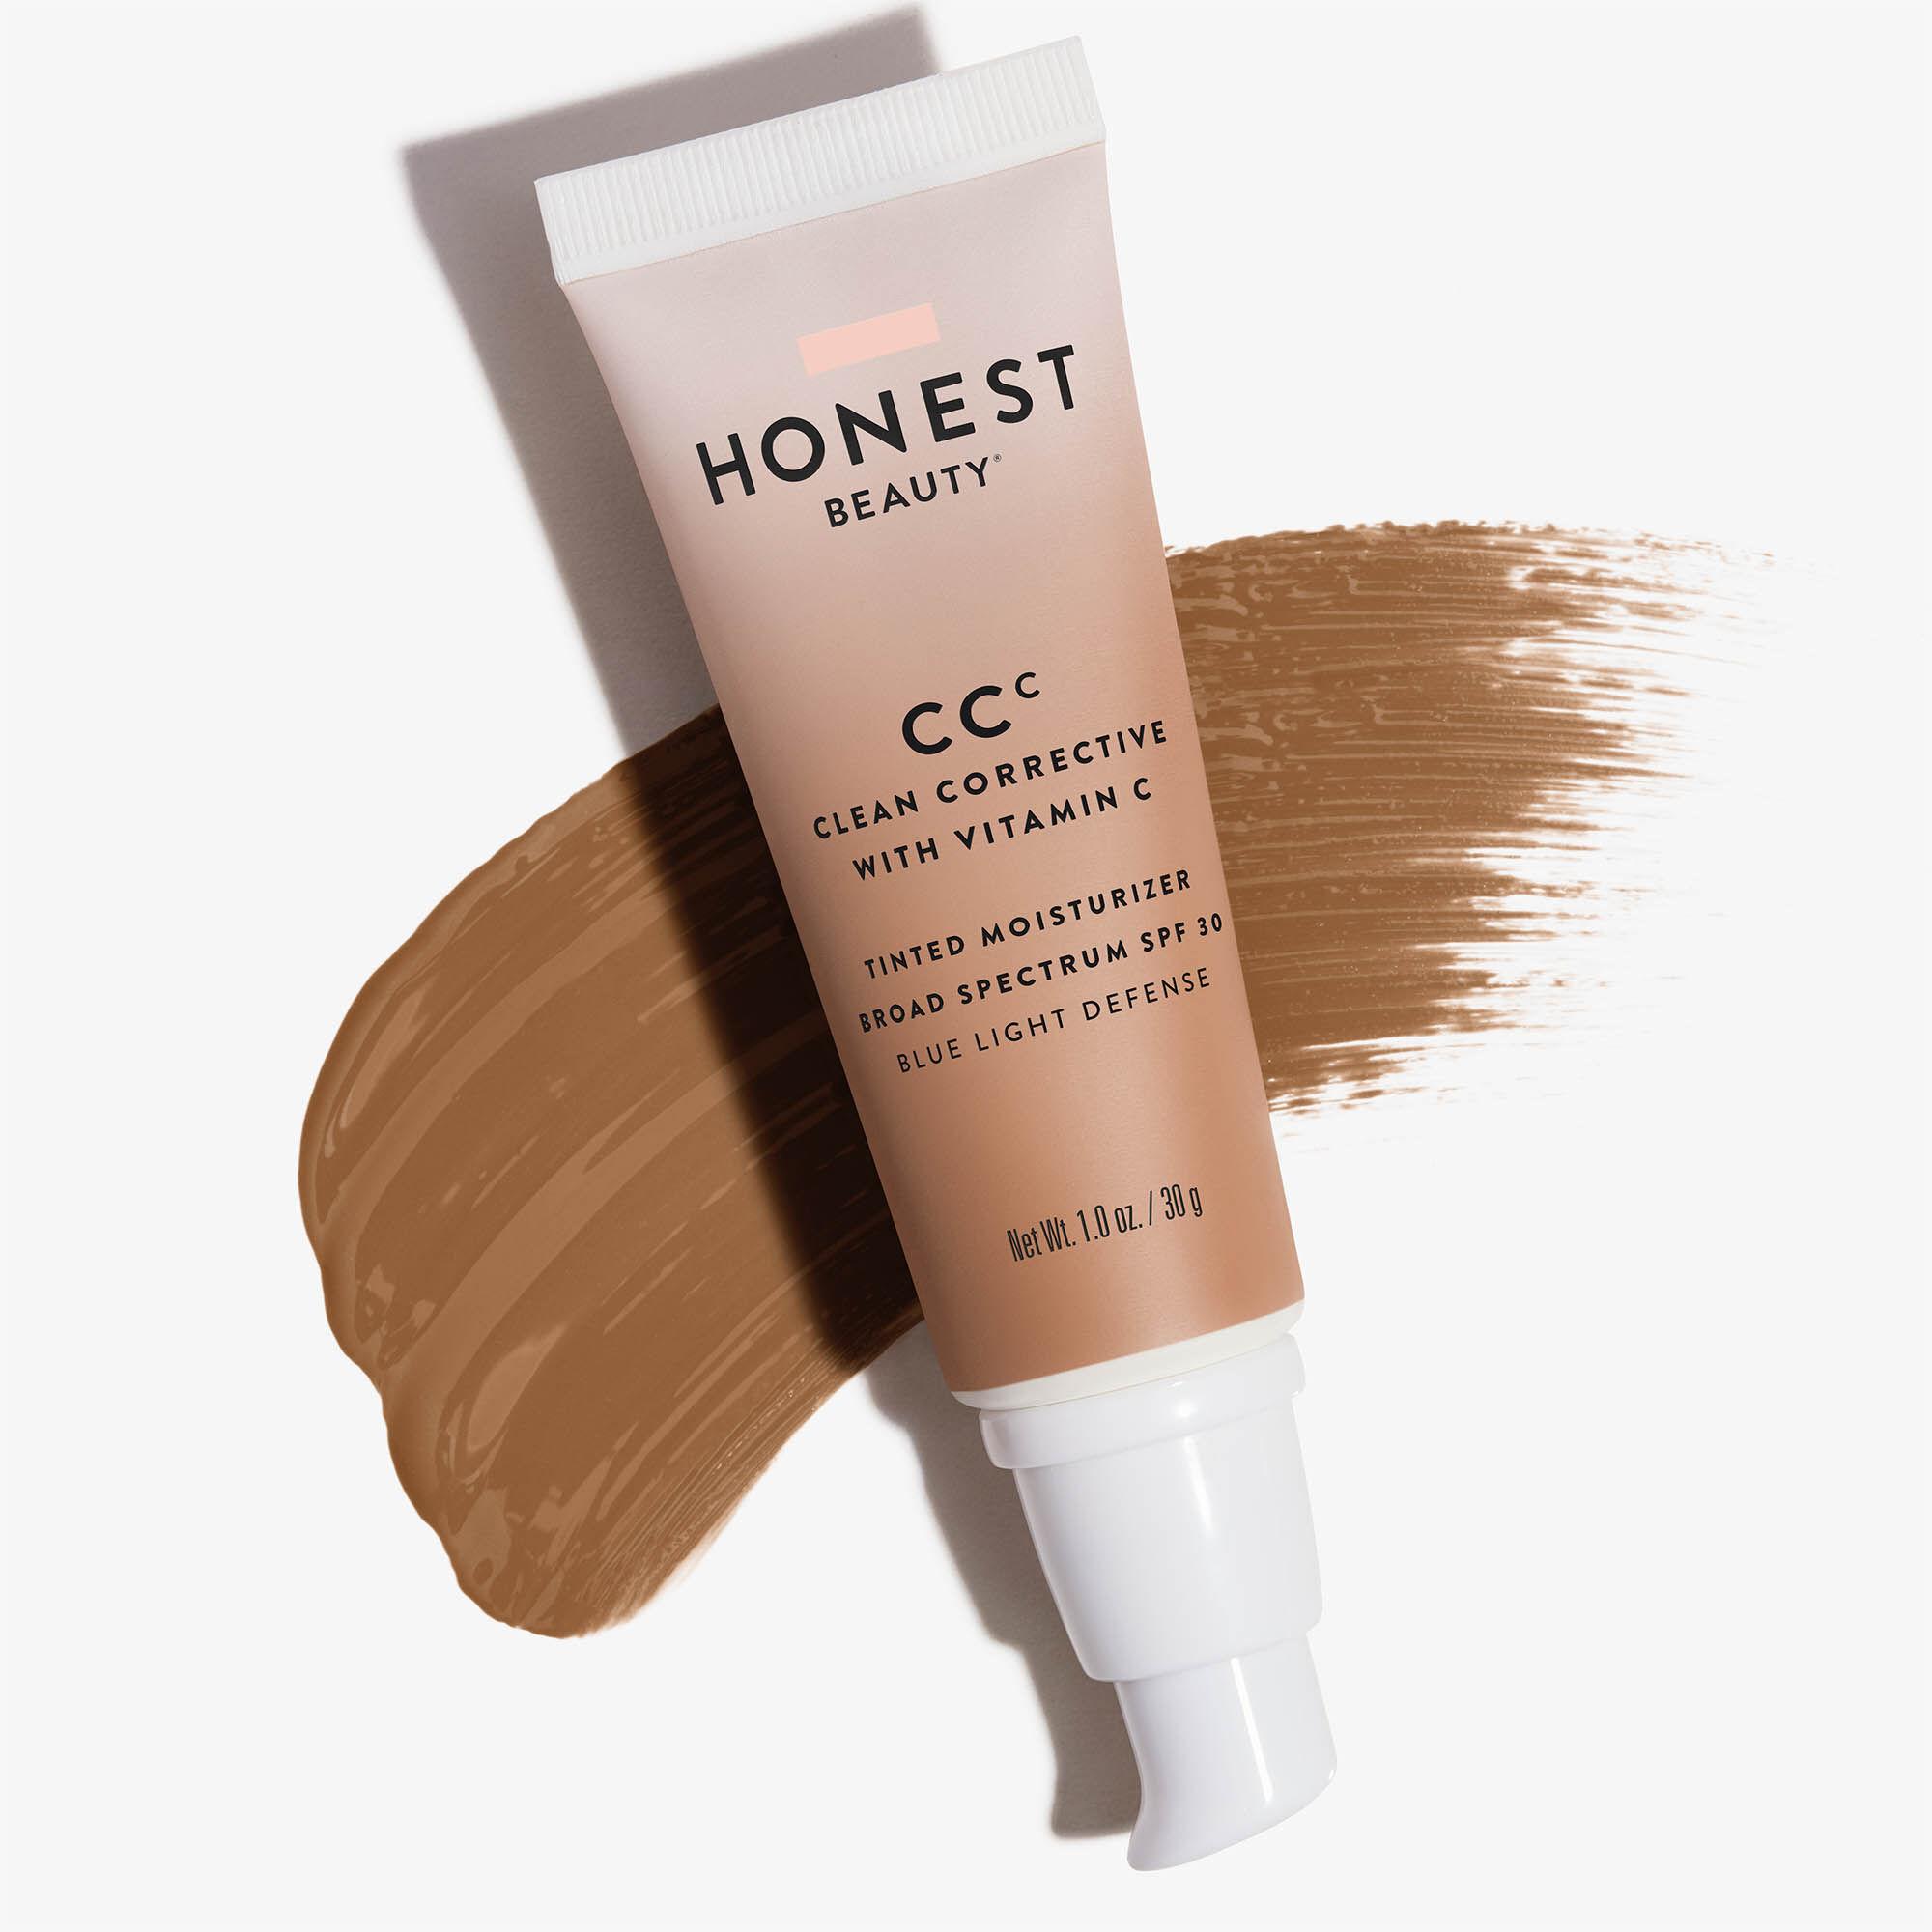 www.honest.com - CCC Clean Corrective With Vitamin C Tinted Moisturizer, Medium